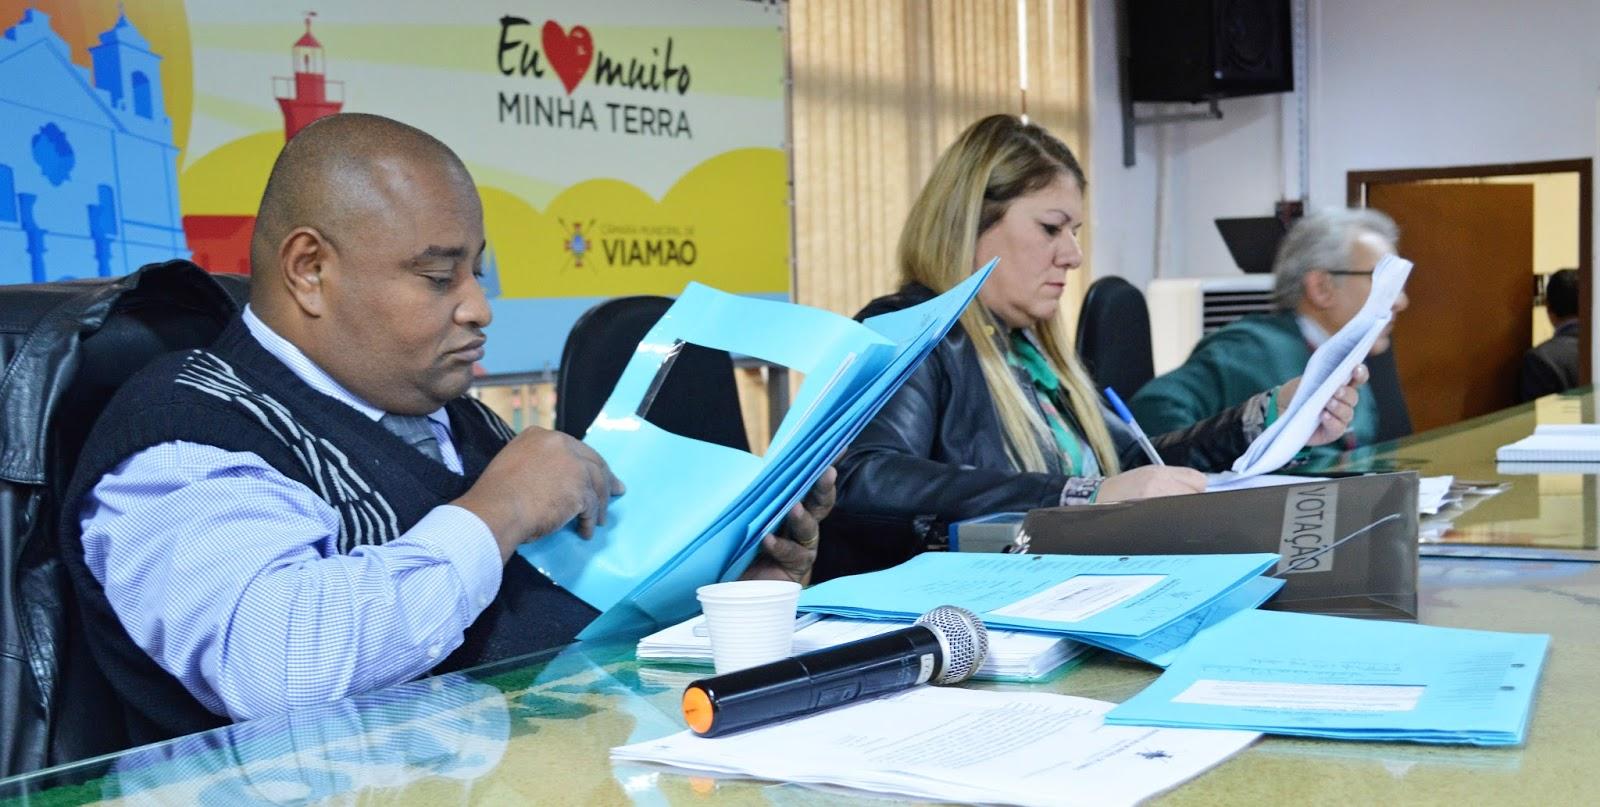 Xandão Gomes manifesta apoio ao projeto de Lei do vereador Guguzinho #216BAA 1600 807